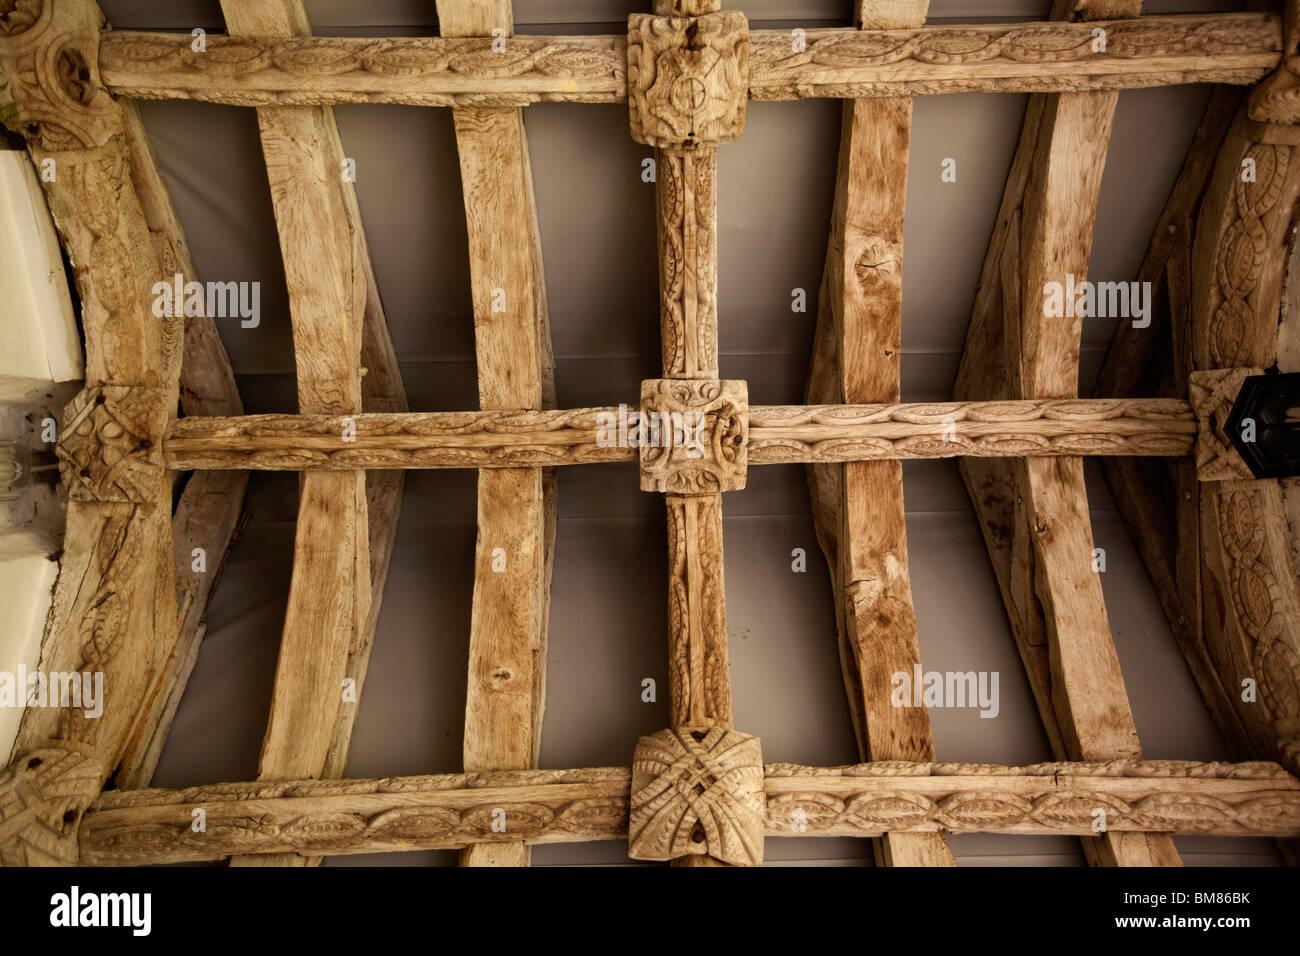 England, Cornwall, Laneast, Kirche St Sidwell und St Gulval, Veranda, alte Eiche Dachkonstruktion Stockbild